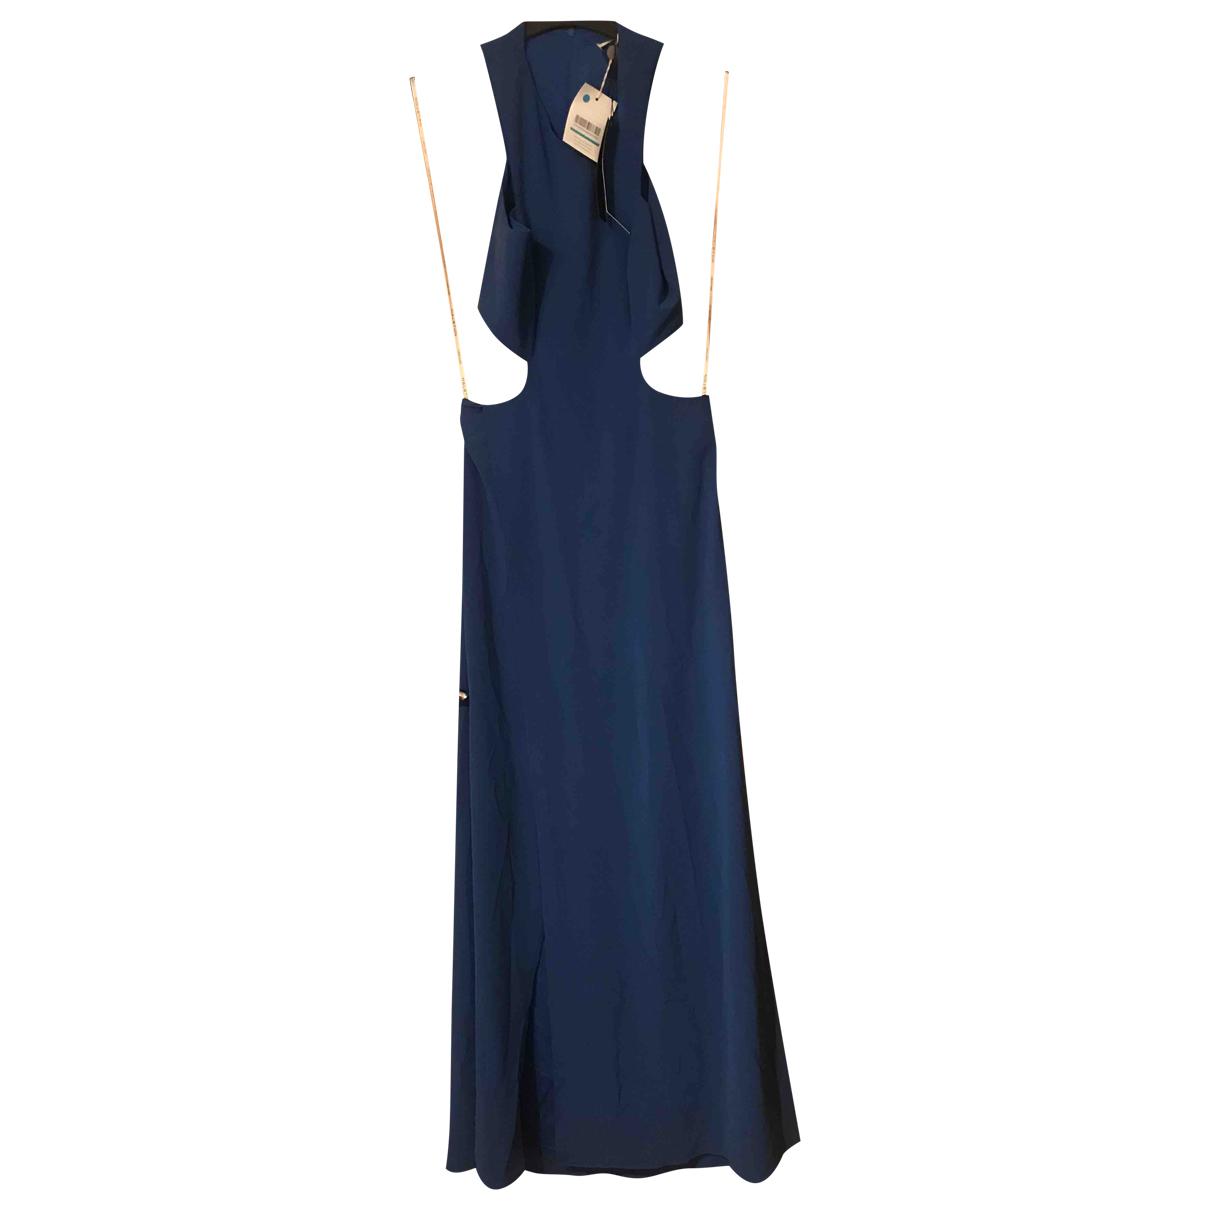 Halston Heritage N Blue dress for Women 4 US